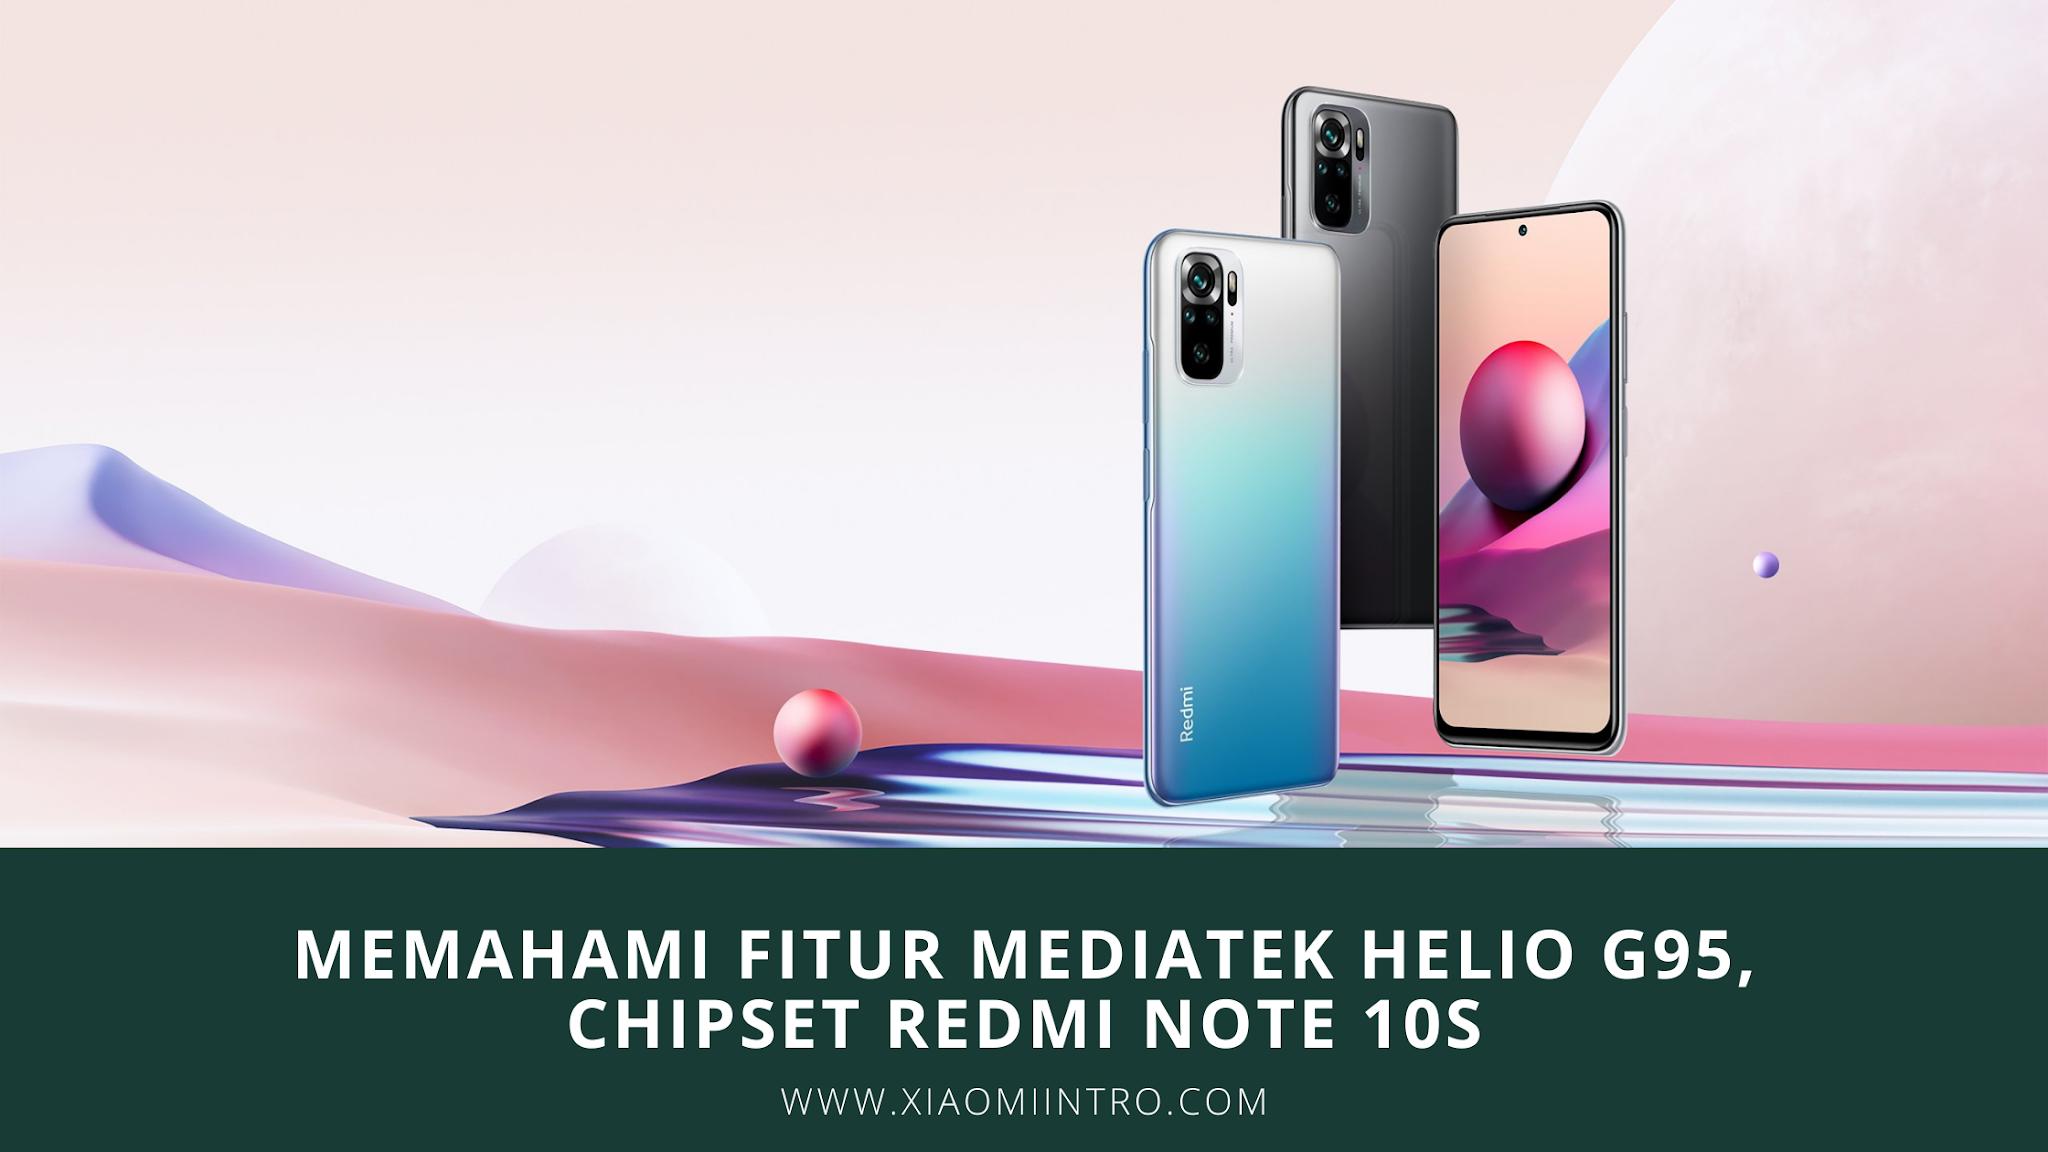 Memahami Fitur Mediatek Helio G95, Chipset Redmi Note 10S